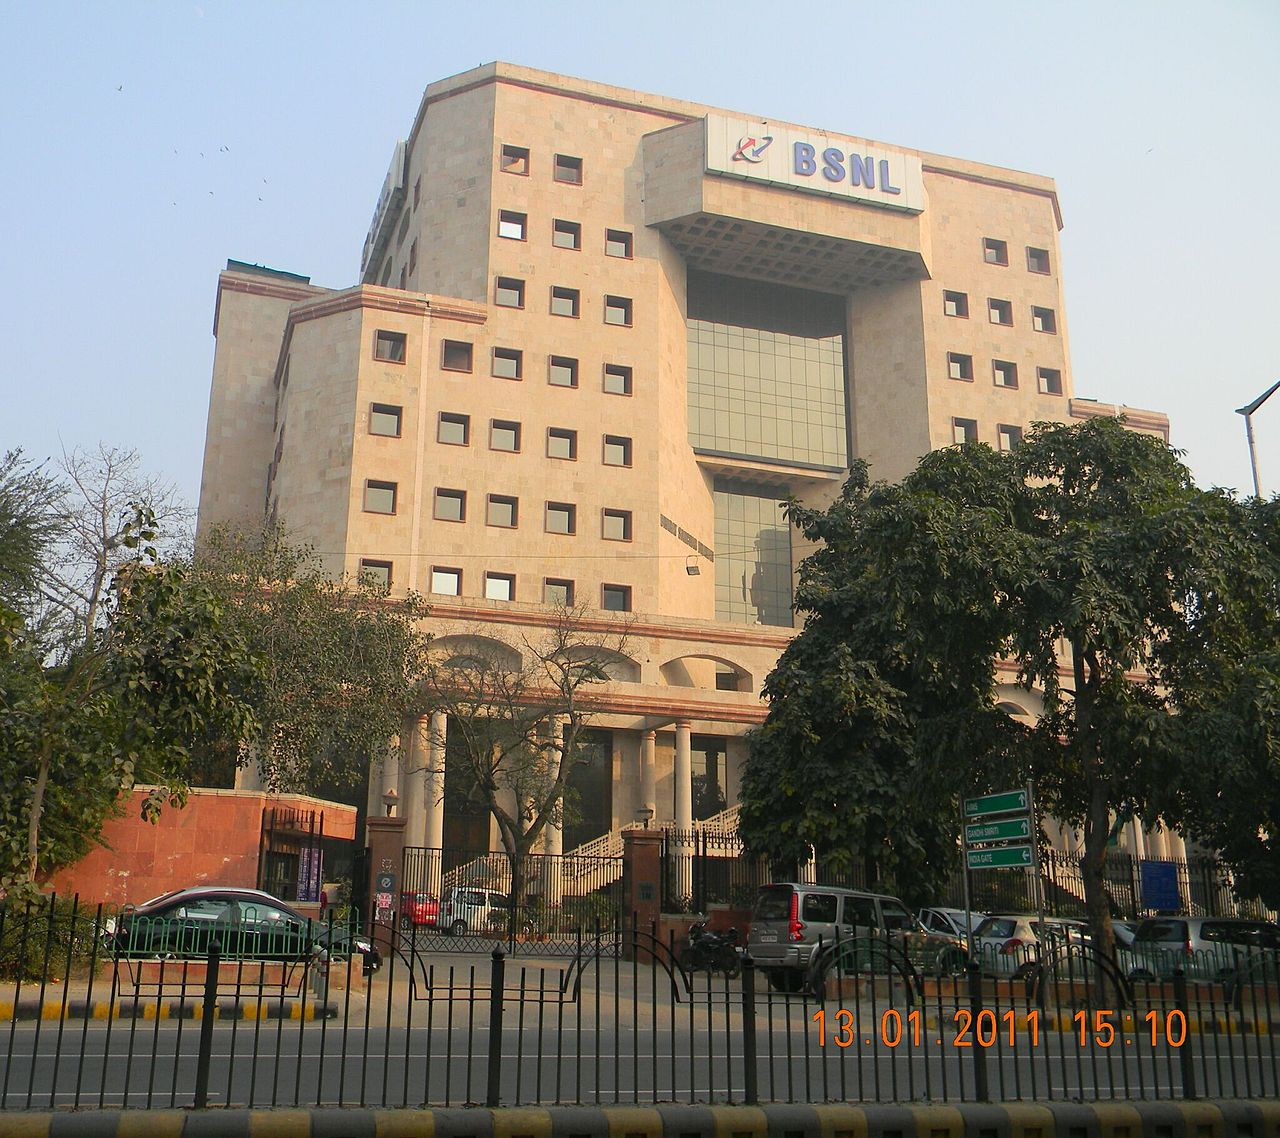 Bharat Sanchar Nigam Limited headquarters